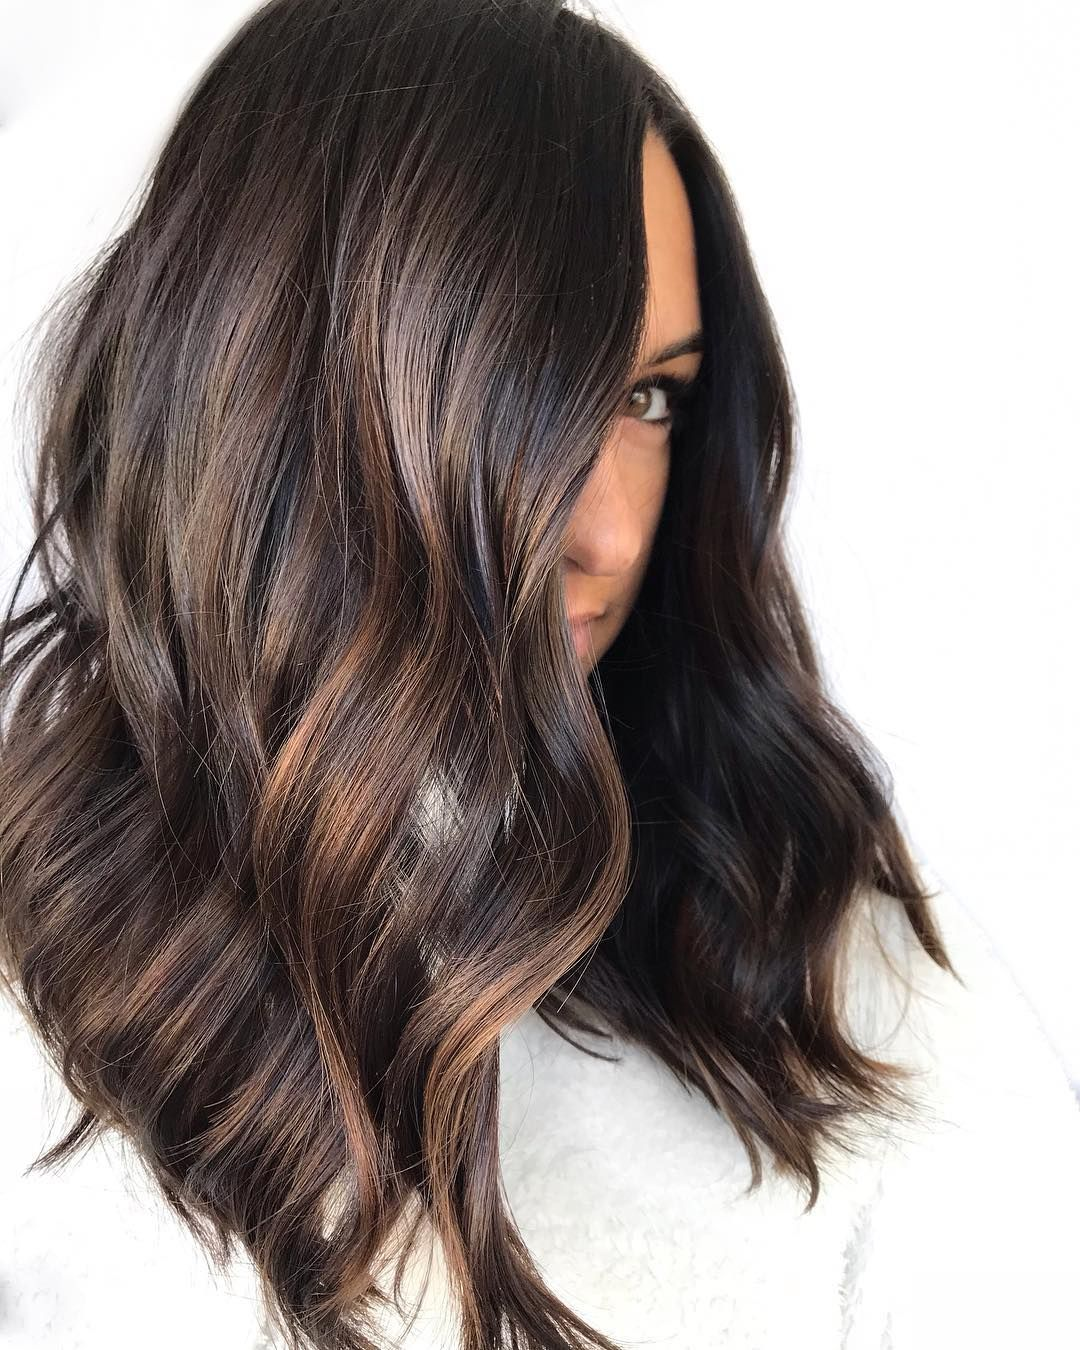 67 Gorgeous Balayage Hair Color Ideas – Best Balayage Highlights